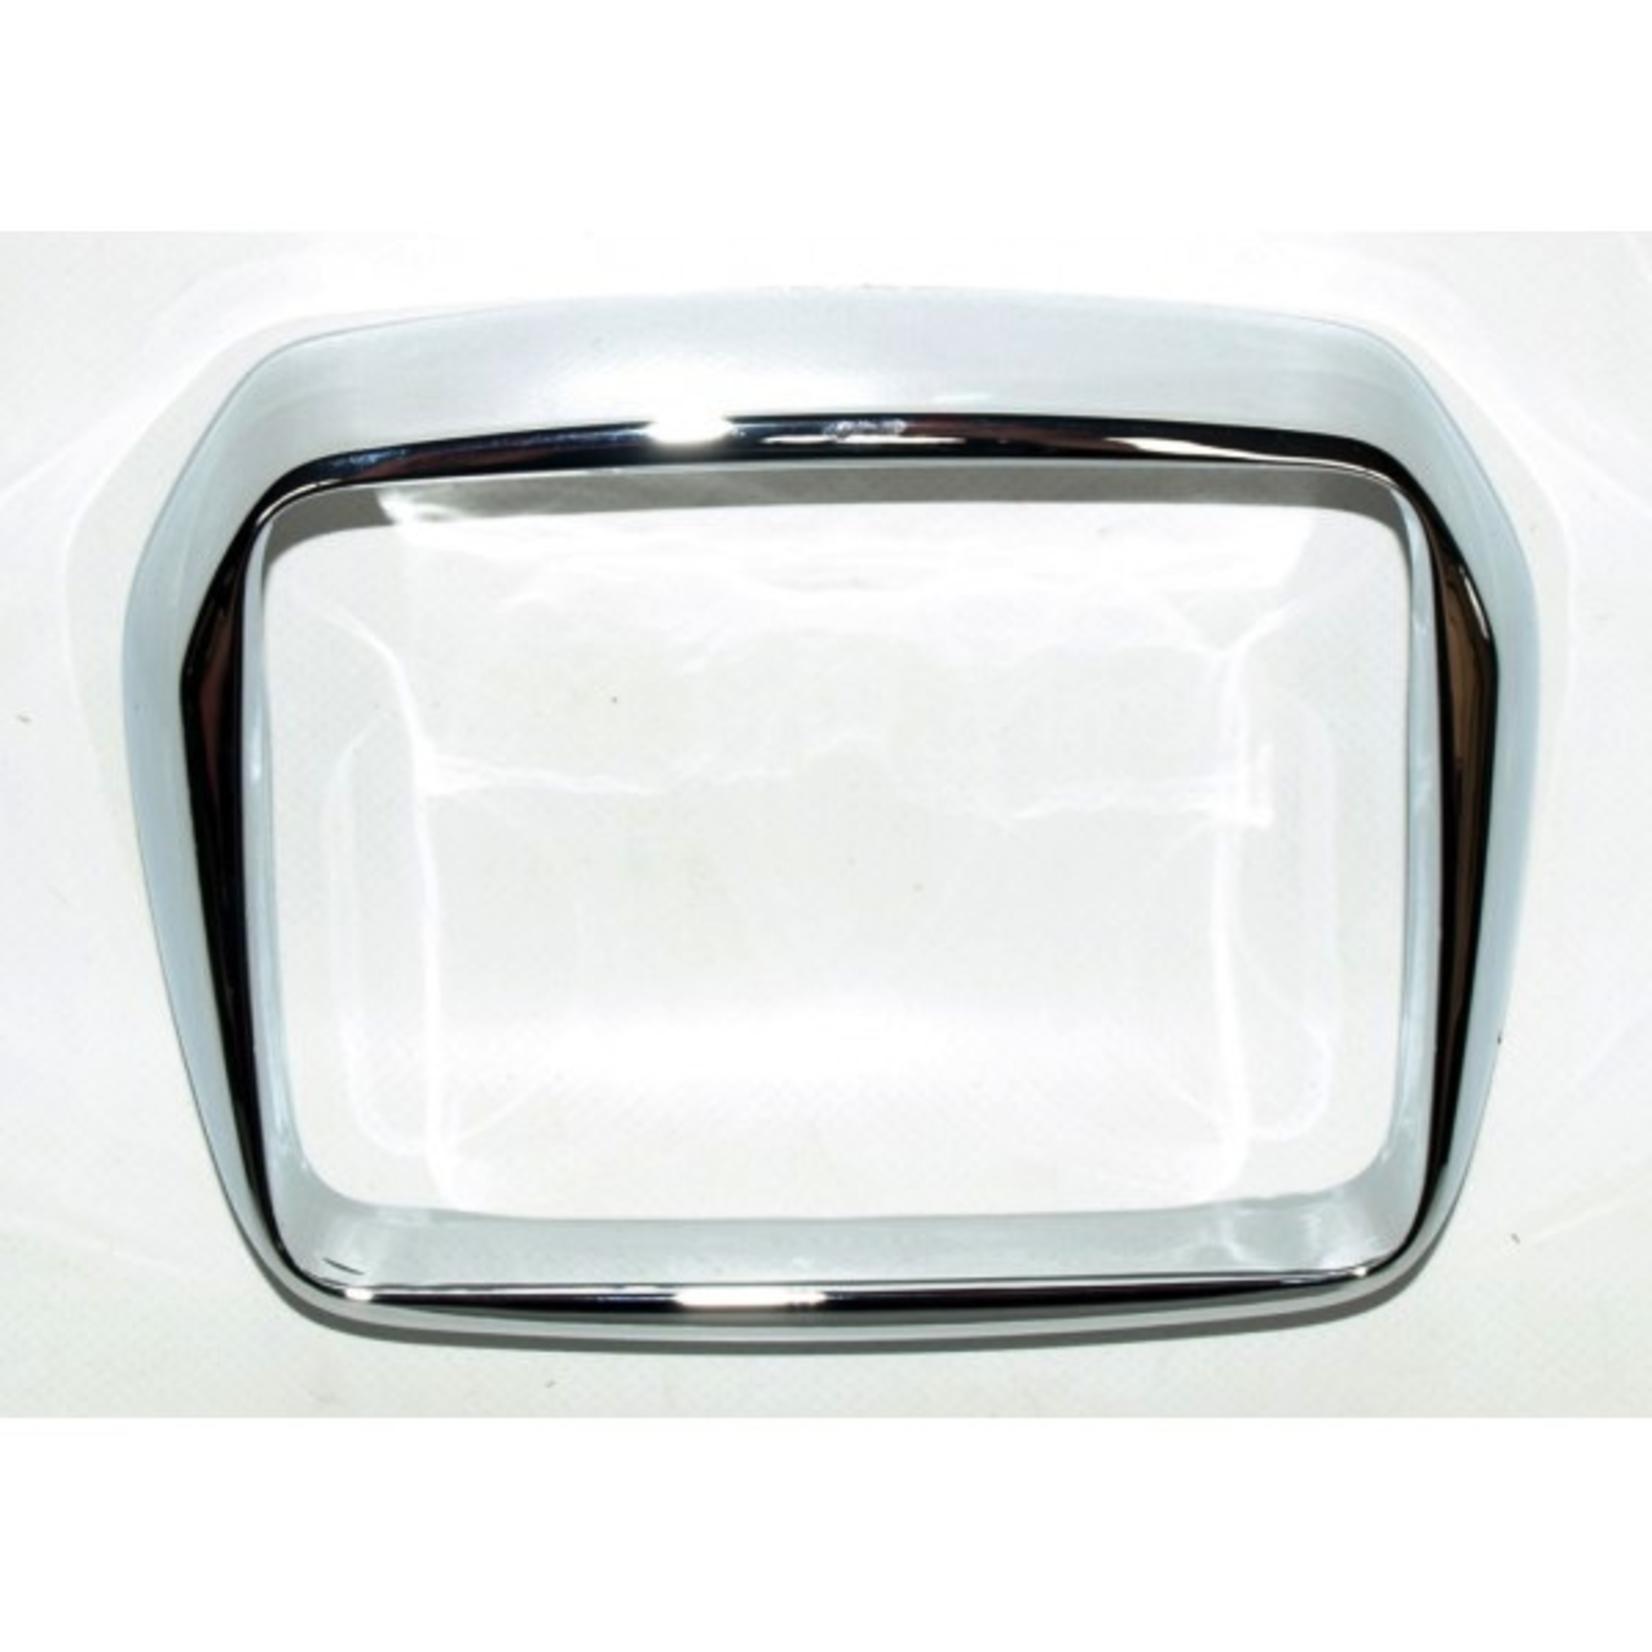 Parts Headlamp Frame, Vespa S Chrome Bezel